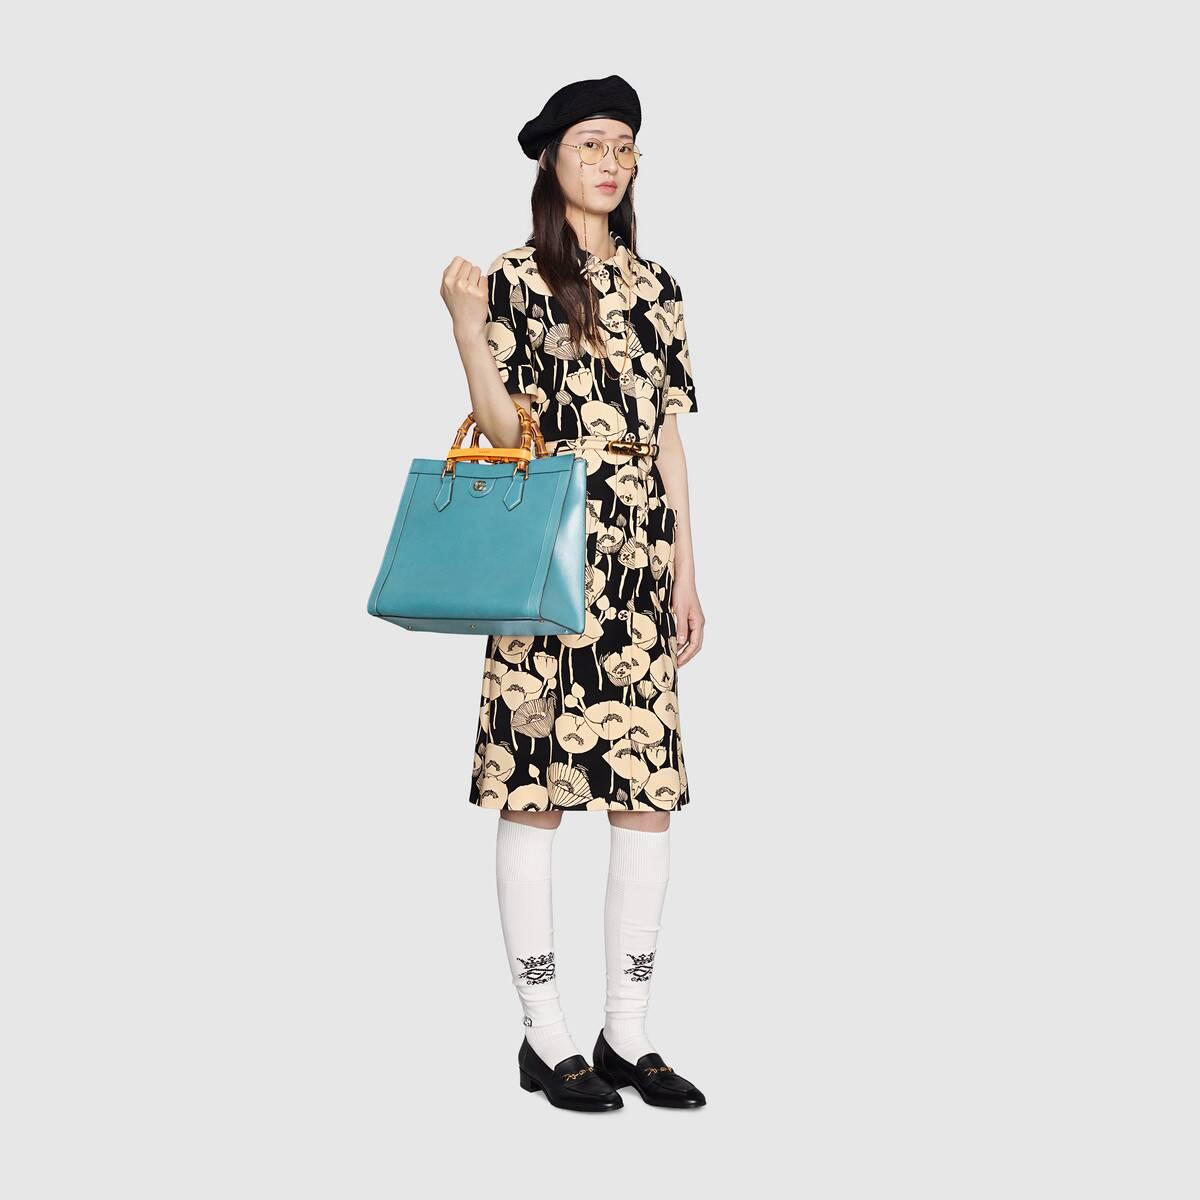 GUCCI Top 10 Fashion Brands Rising in 2021